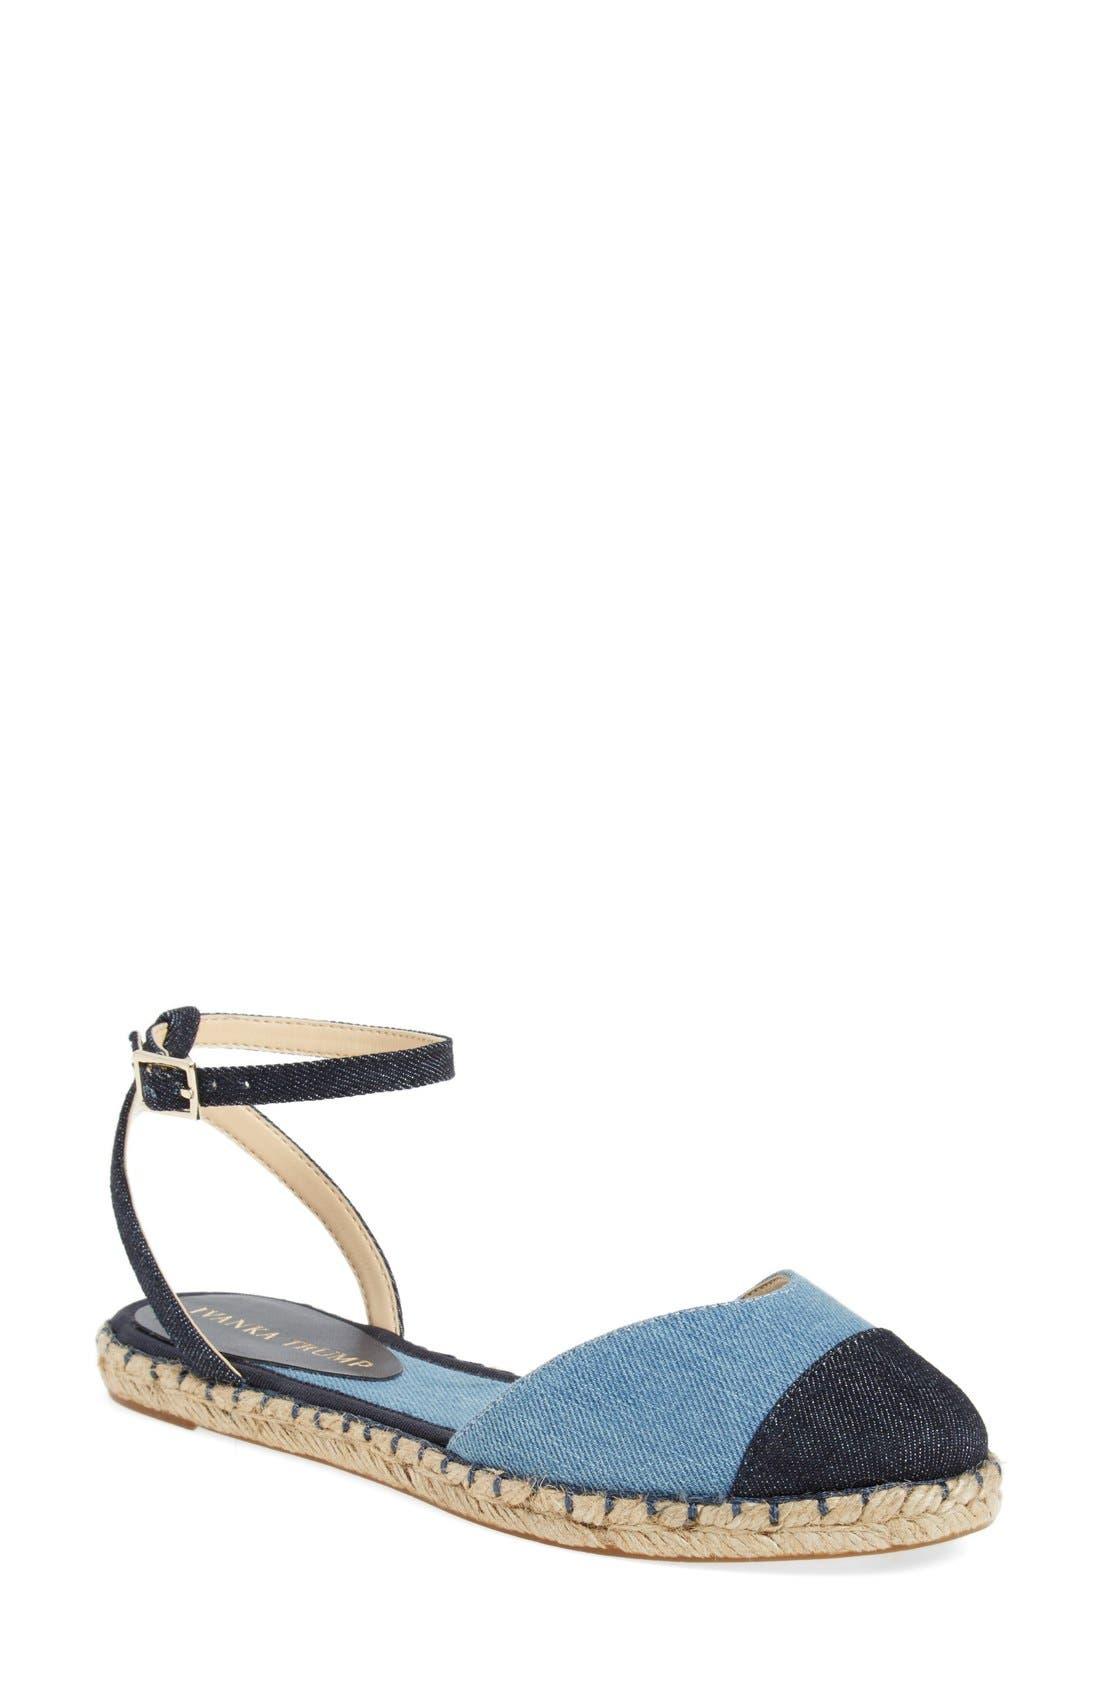 Main Image - Ivanka Trump 'Rion' Ankle Strap Espadrille Flat (Women)